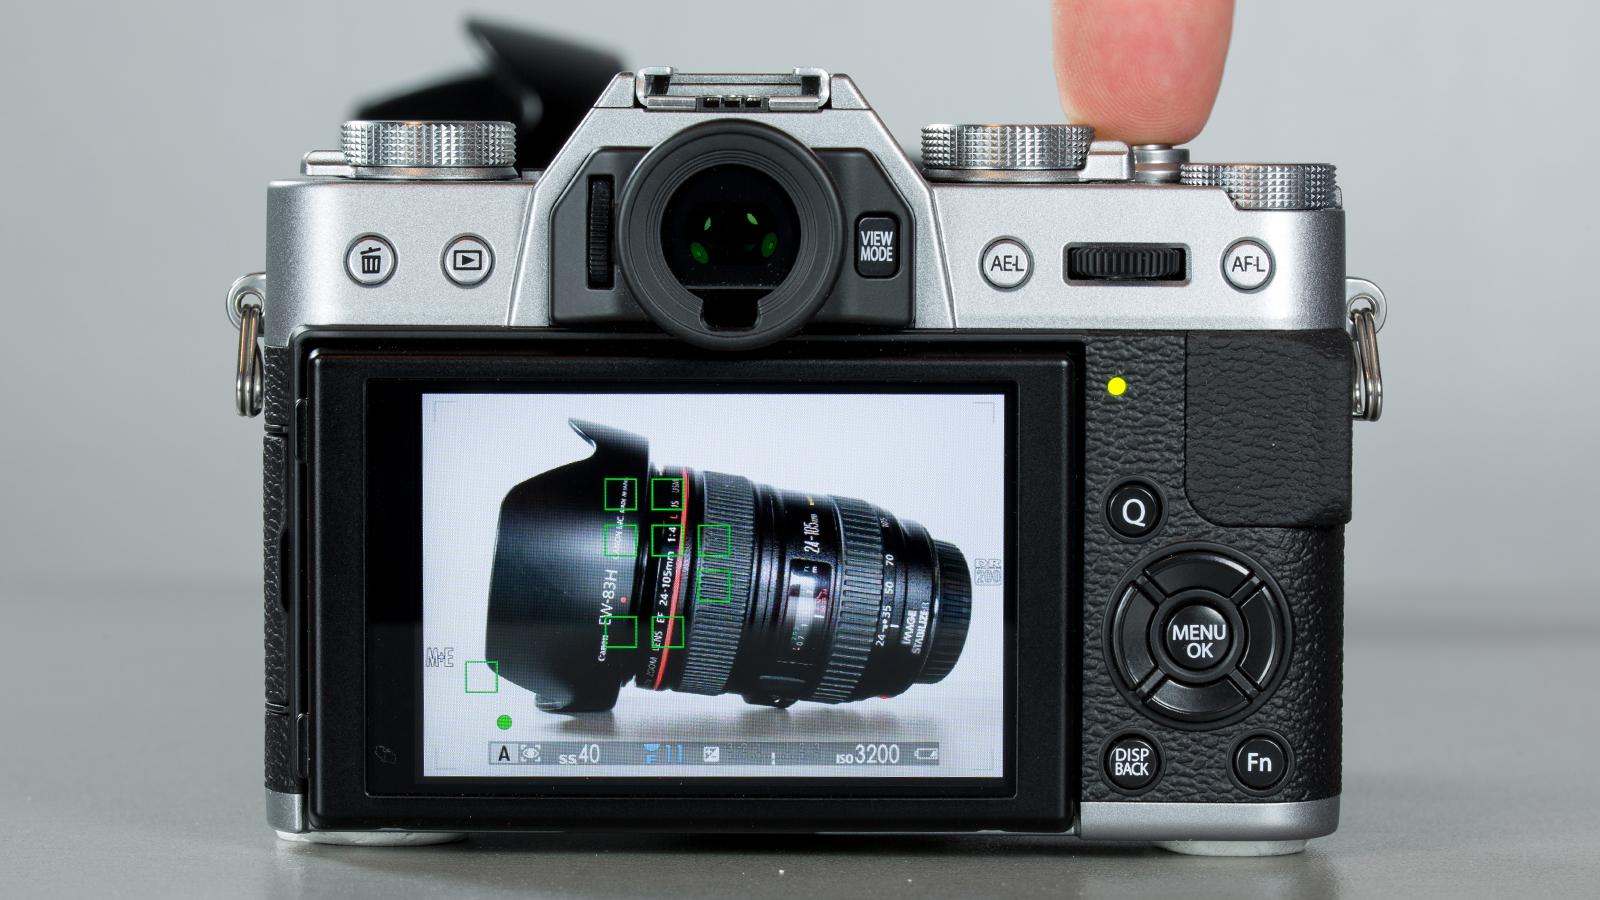 Fujifilm-X-T10-DT-020-AF